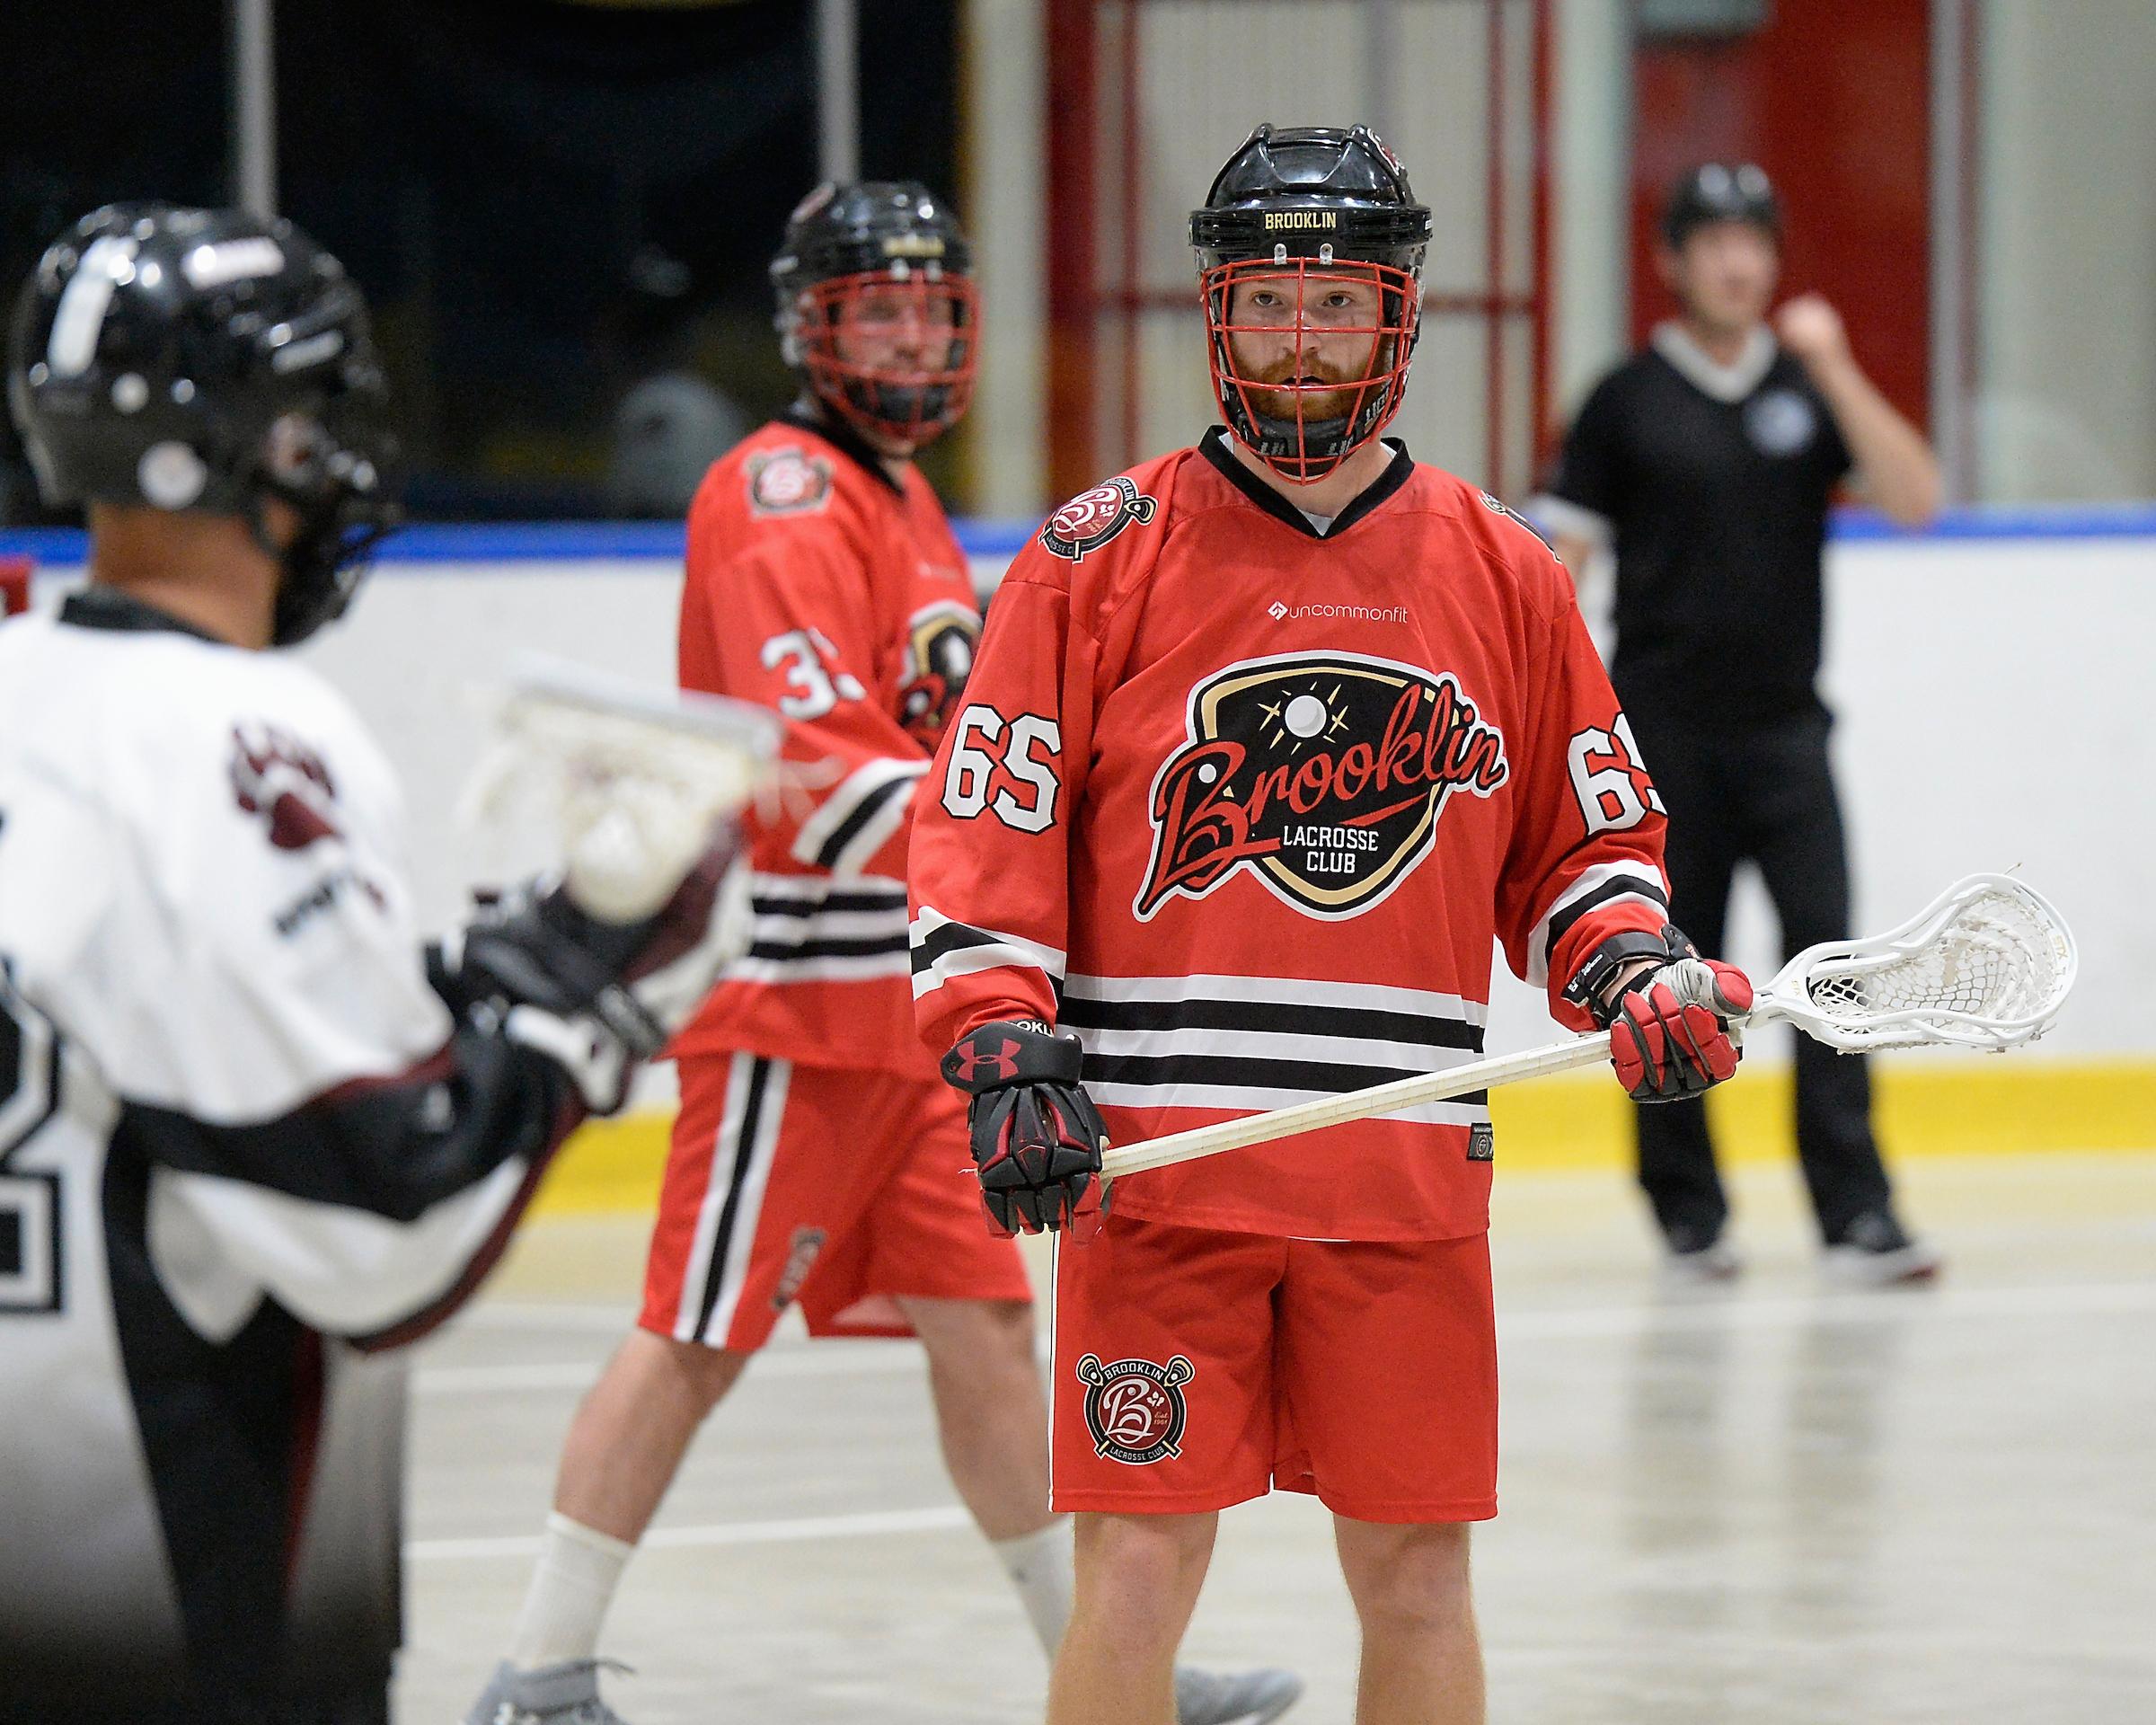 Photo: Shawn Muir/Brooklin Lacrosse Club